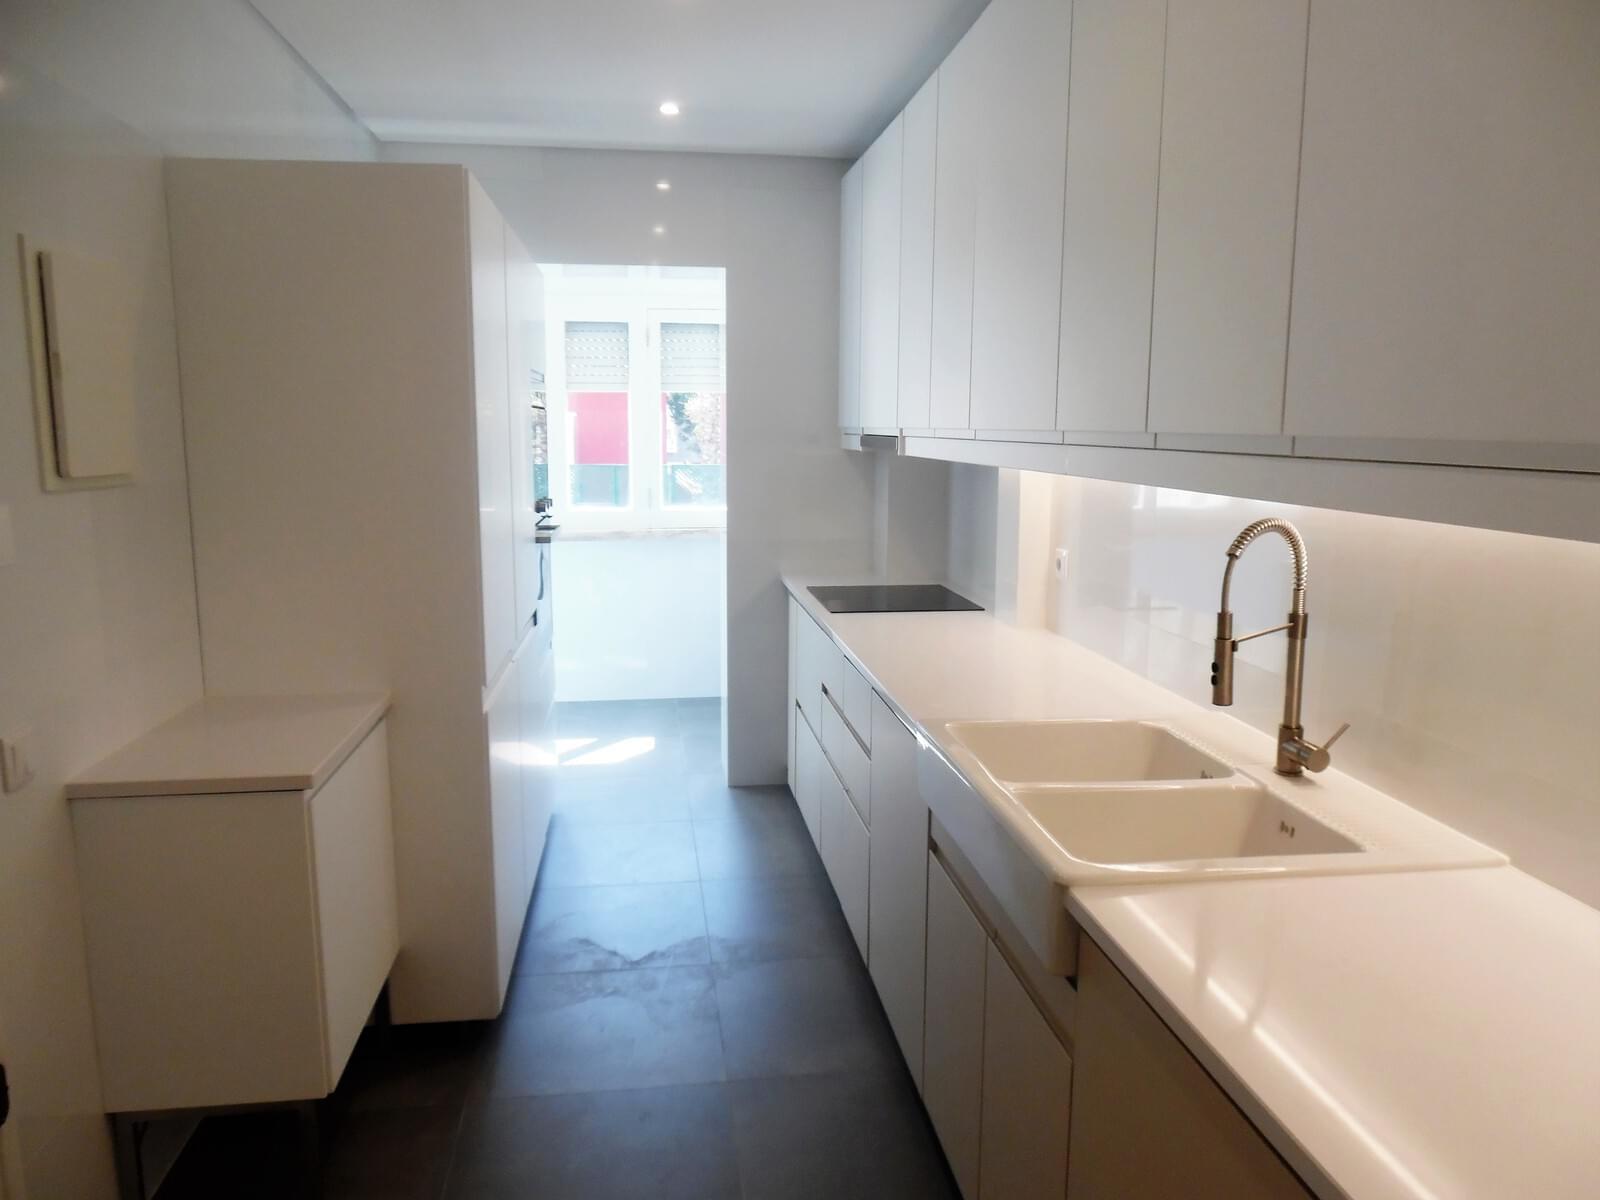 pf17621-apartamento-t4-lisboa-c195c227-9166-4445-a547-a3271d73aee5